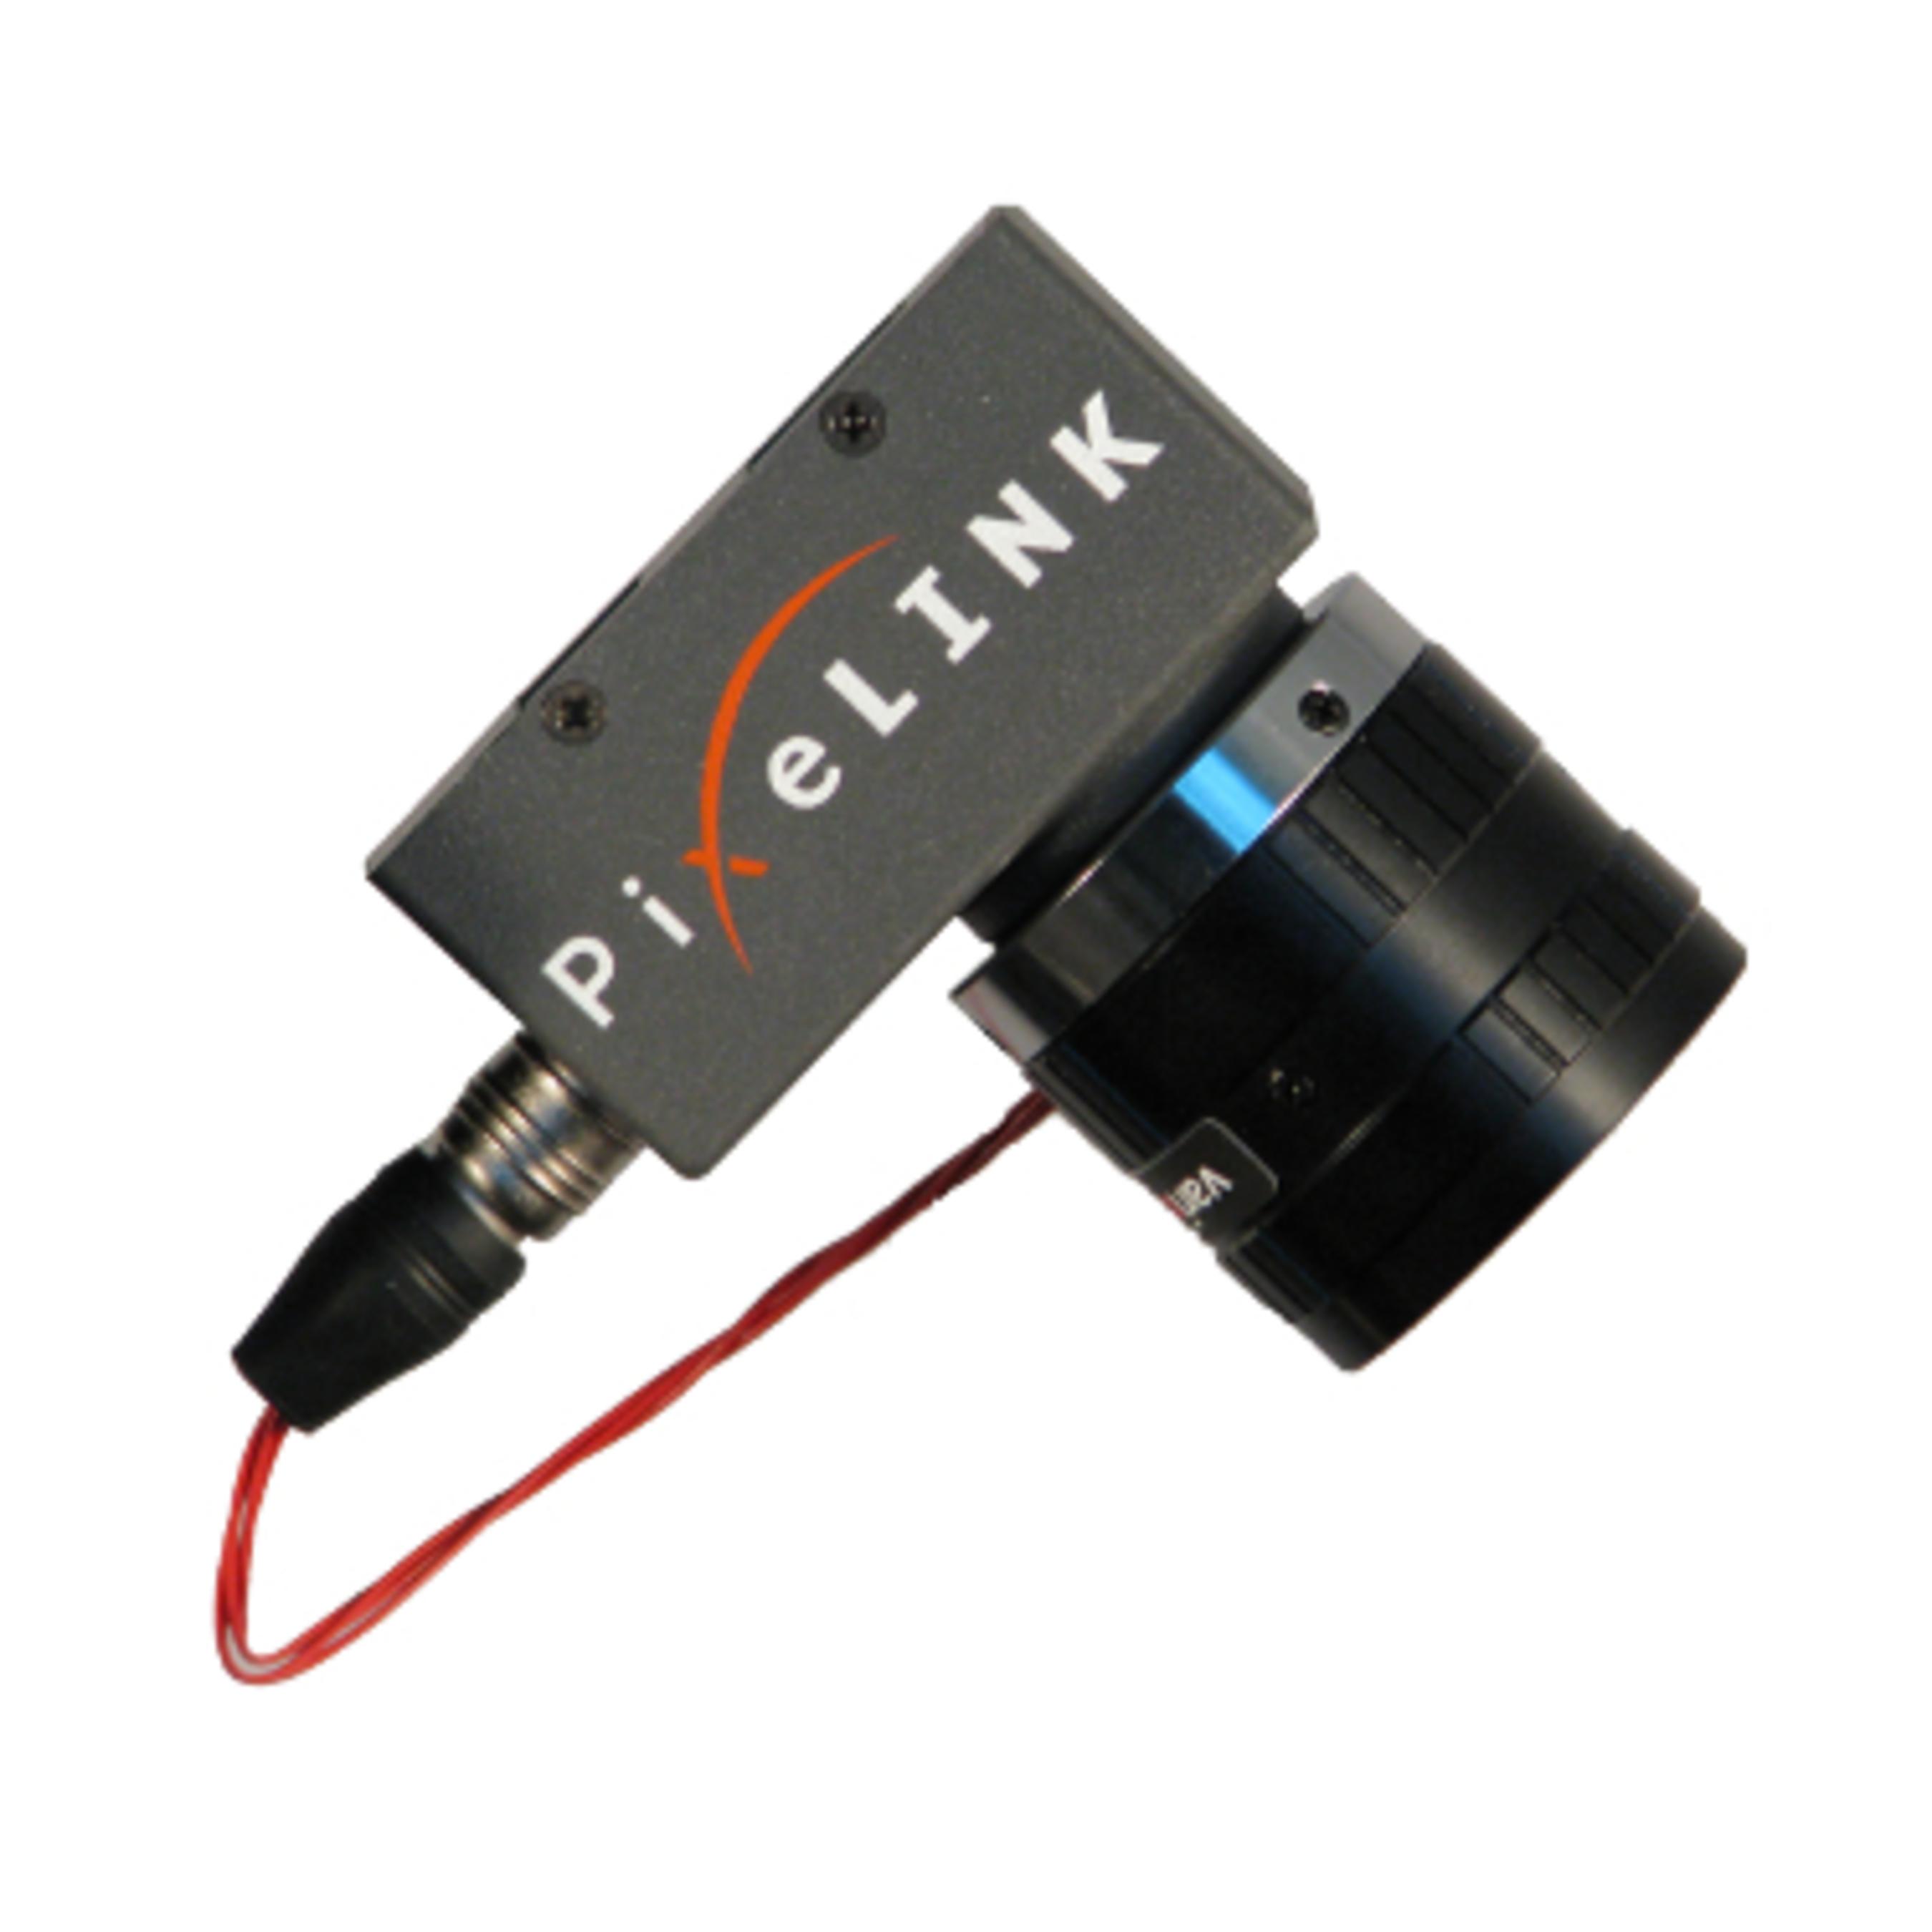 PixeLINK leverages Varioptic electrowetting liquid lens technology (PRNewsFoto/PixeLINK)